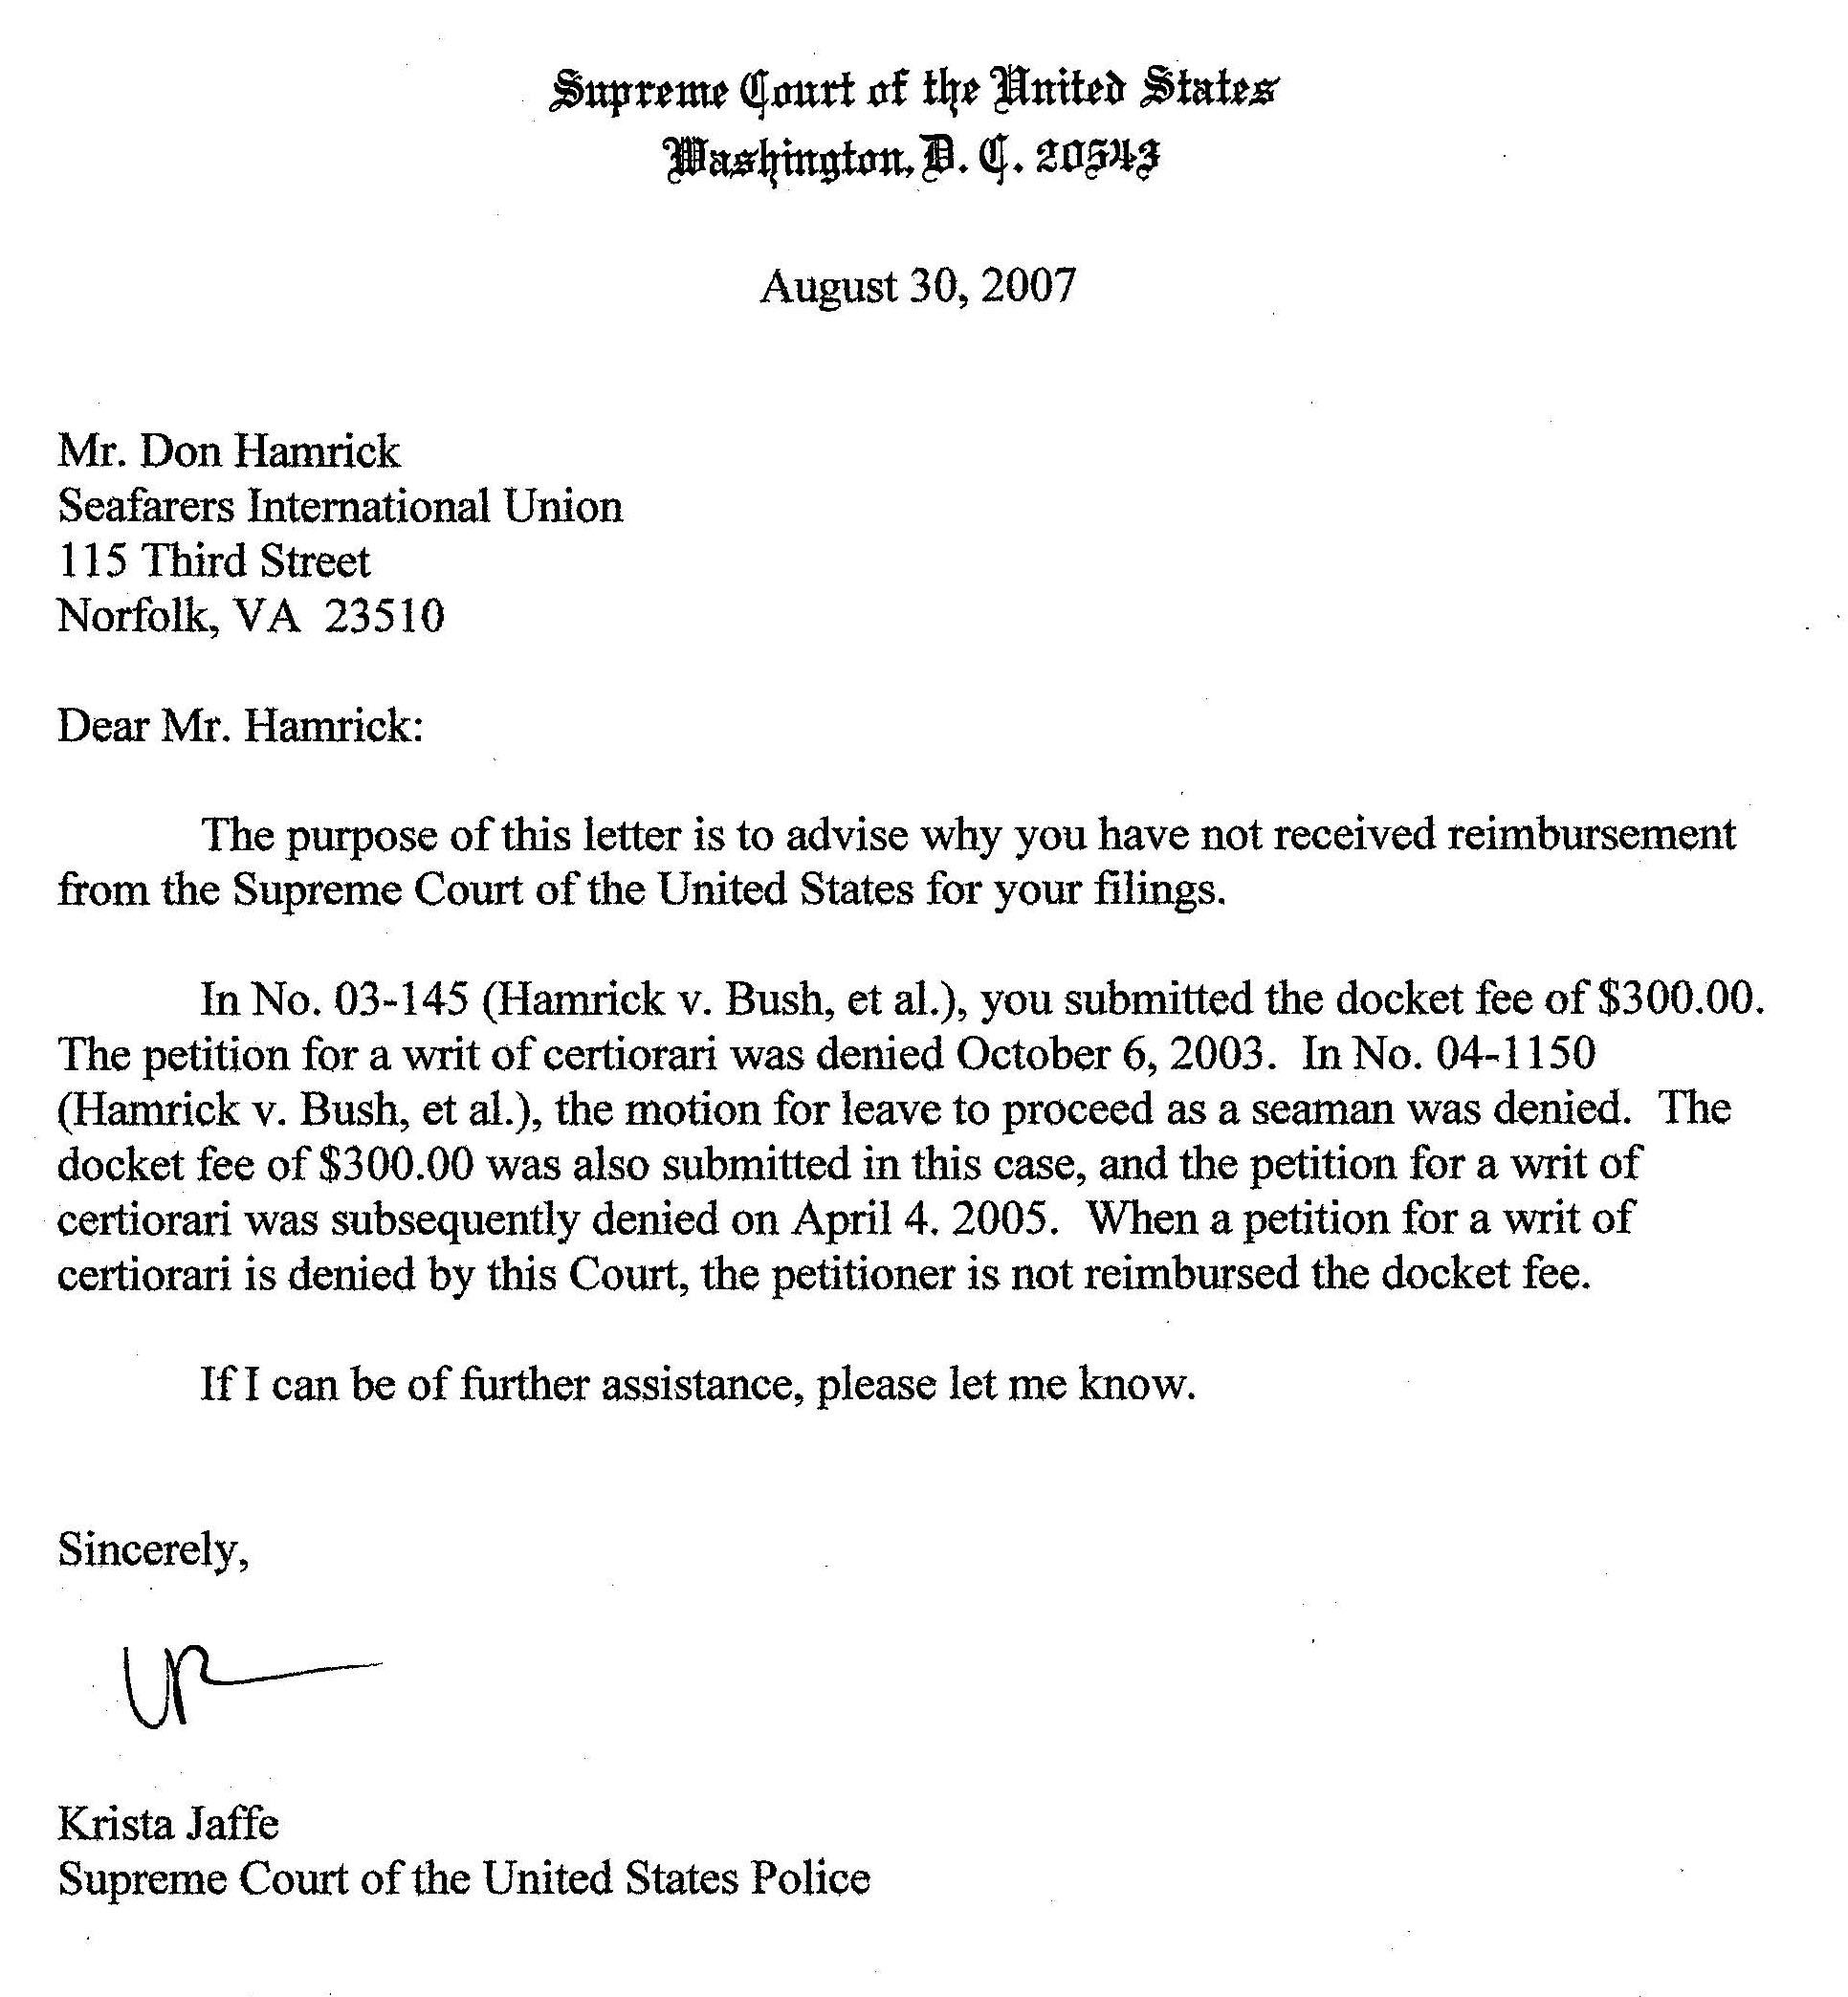 cover letter usc trojans5 usc honest cover letter supreme court ltr